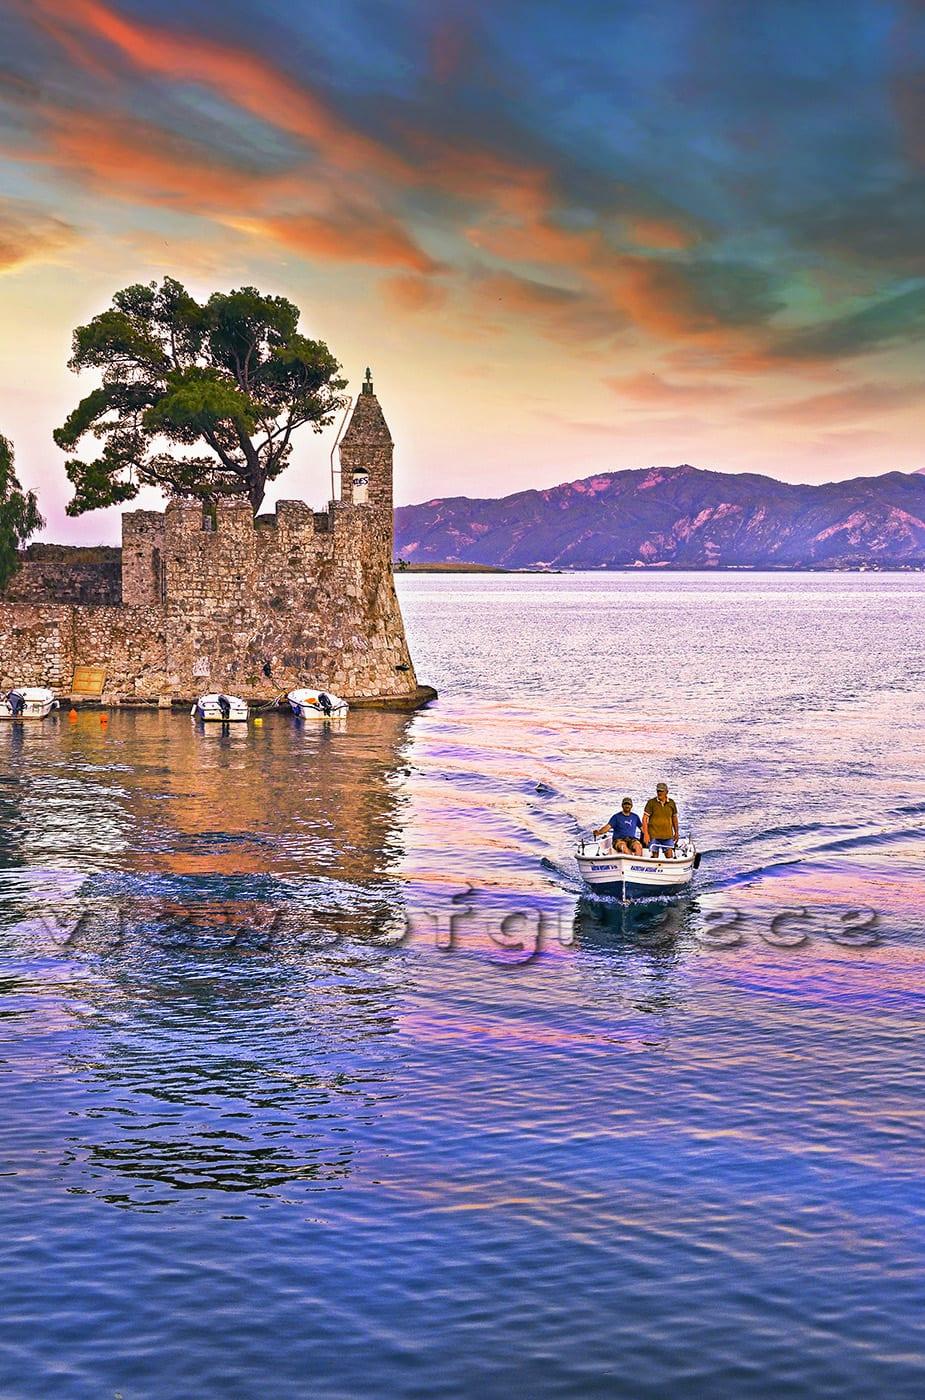 Nafpaktos town, architecture, bay, city, coast, culture, Greece, medieval harbor, historic, traditional village, Ελλάδα, Ναύπακτος, ταξίδια, Κορινθιακός κόλπος, κάστρο, ενετικό λιμάνι, παραλίες